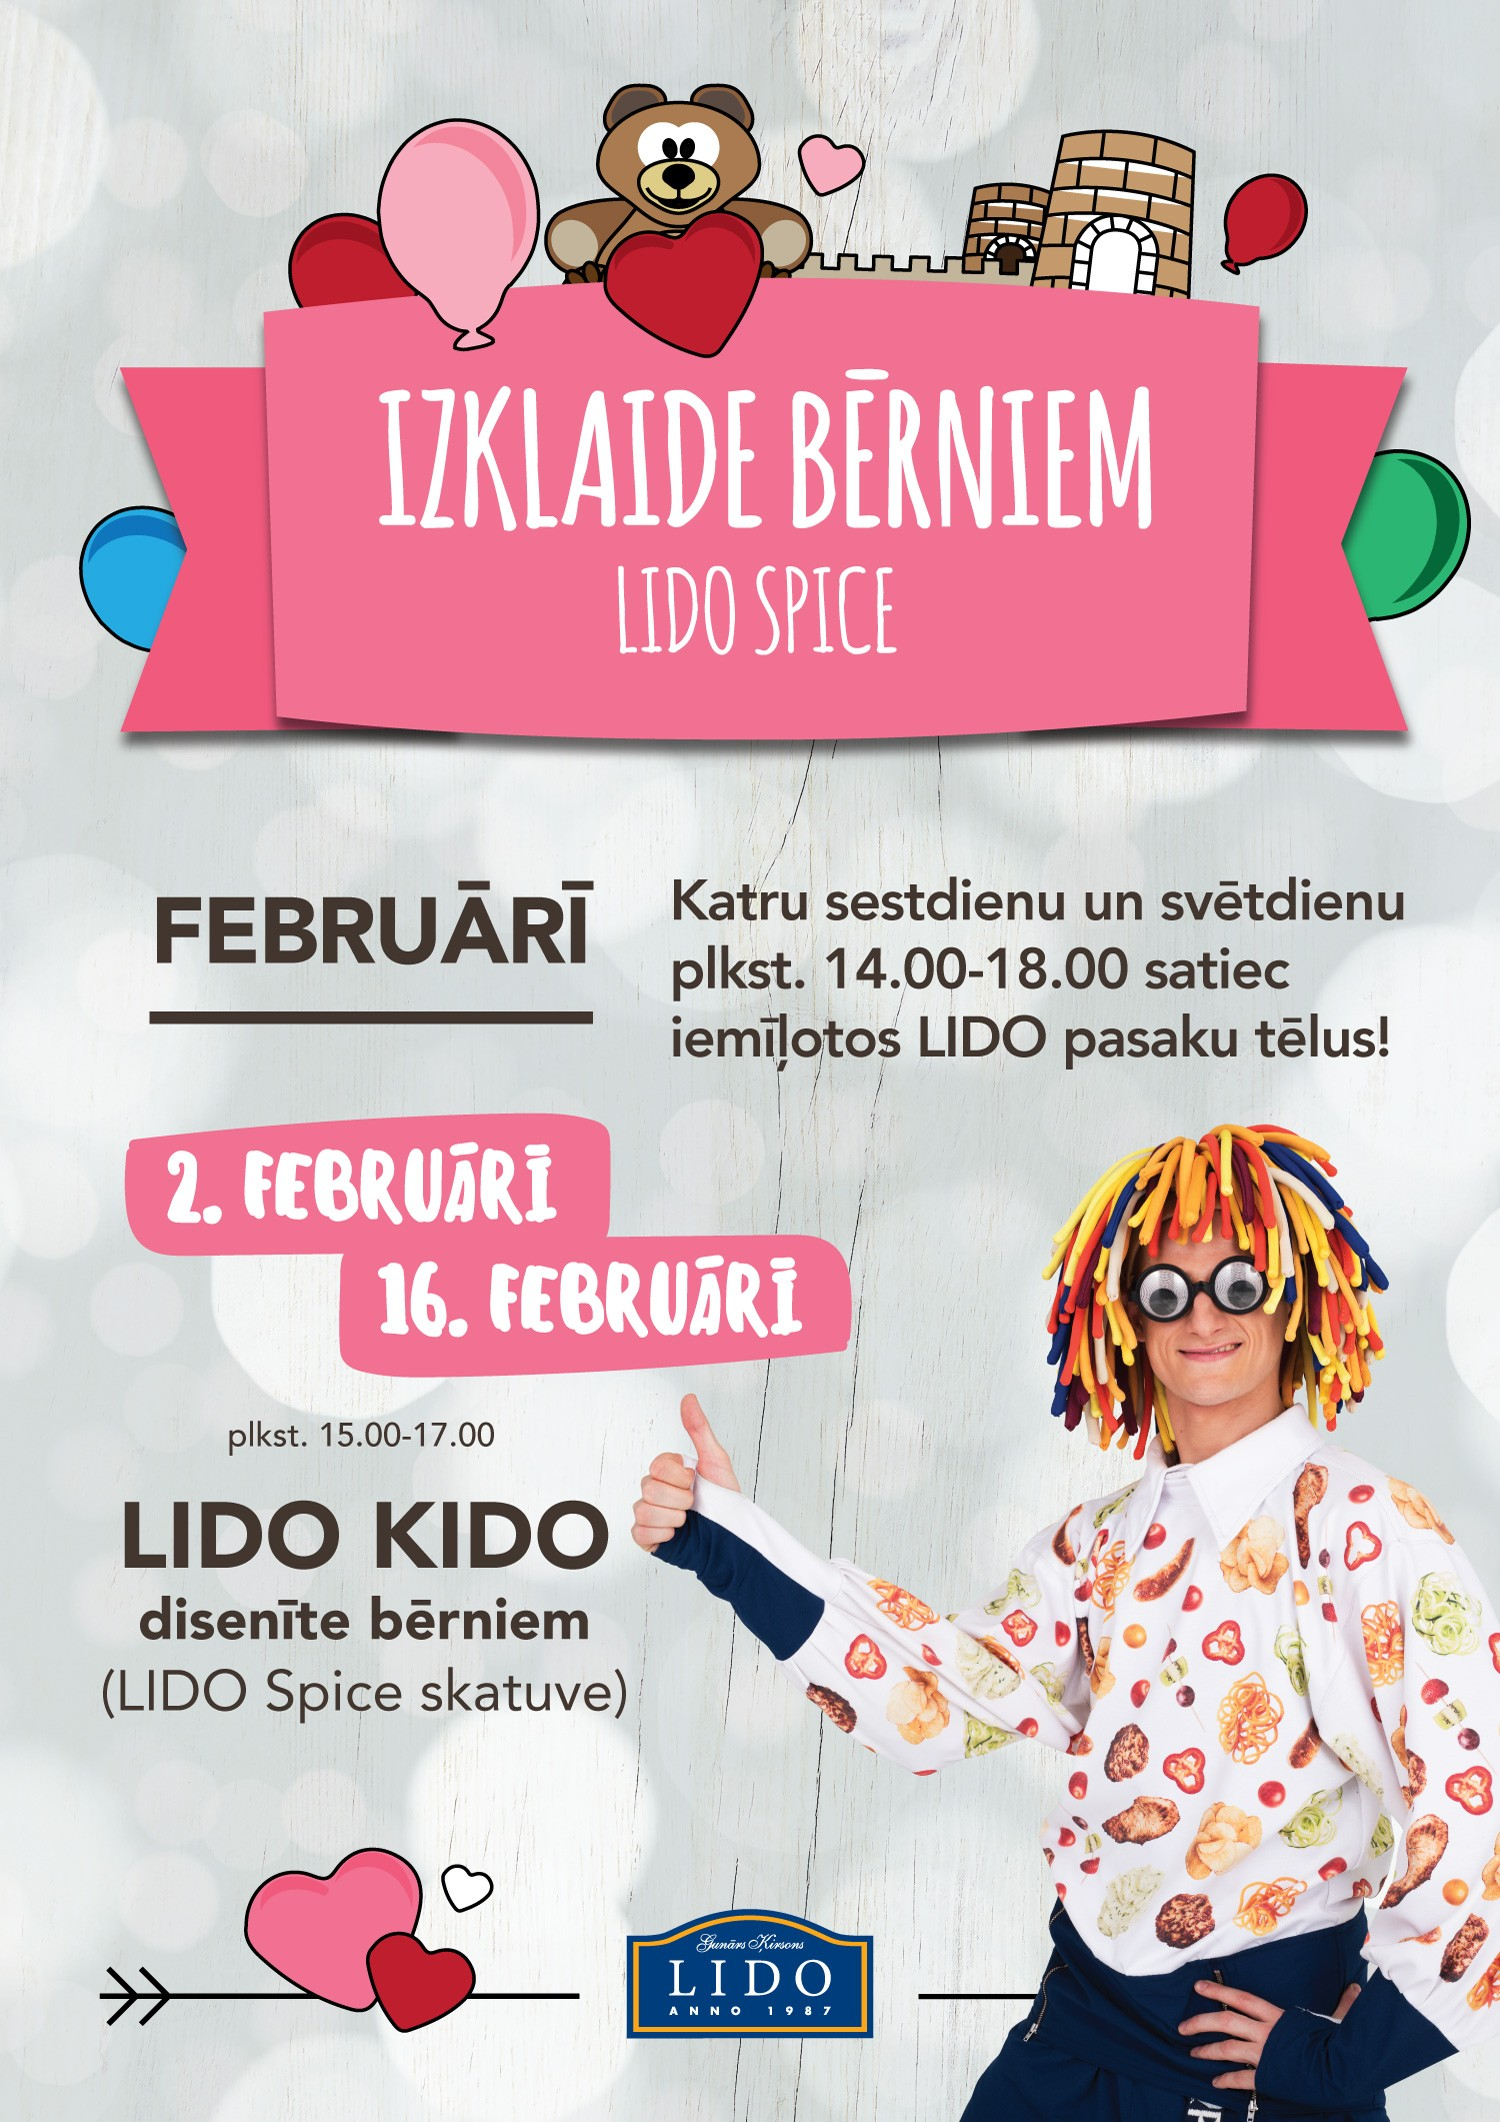 Izklaide-Berniem-Spice-Februaris-A3-Druka.jpg